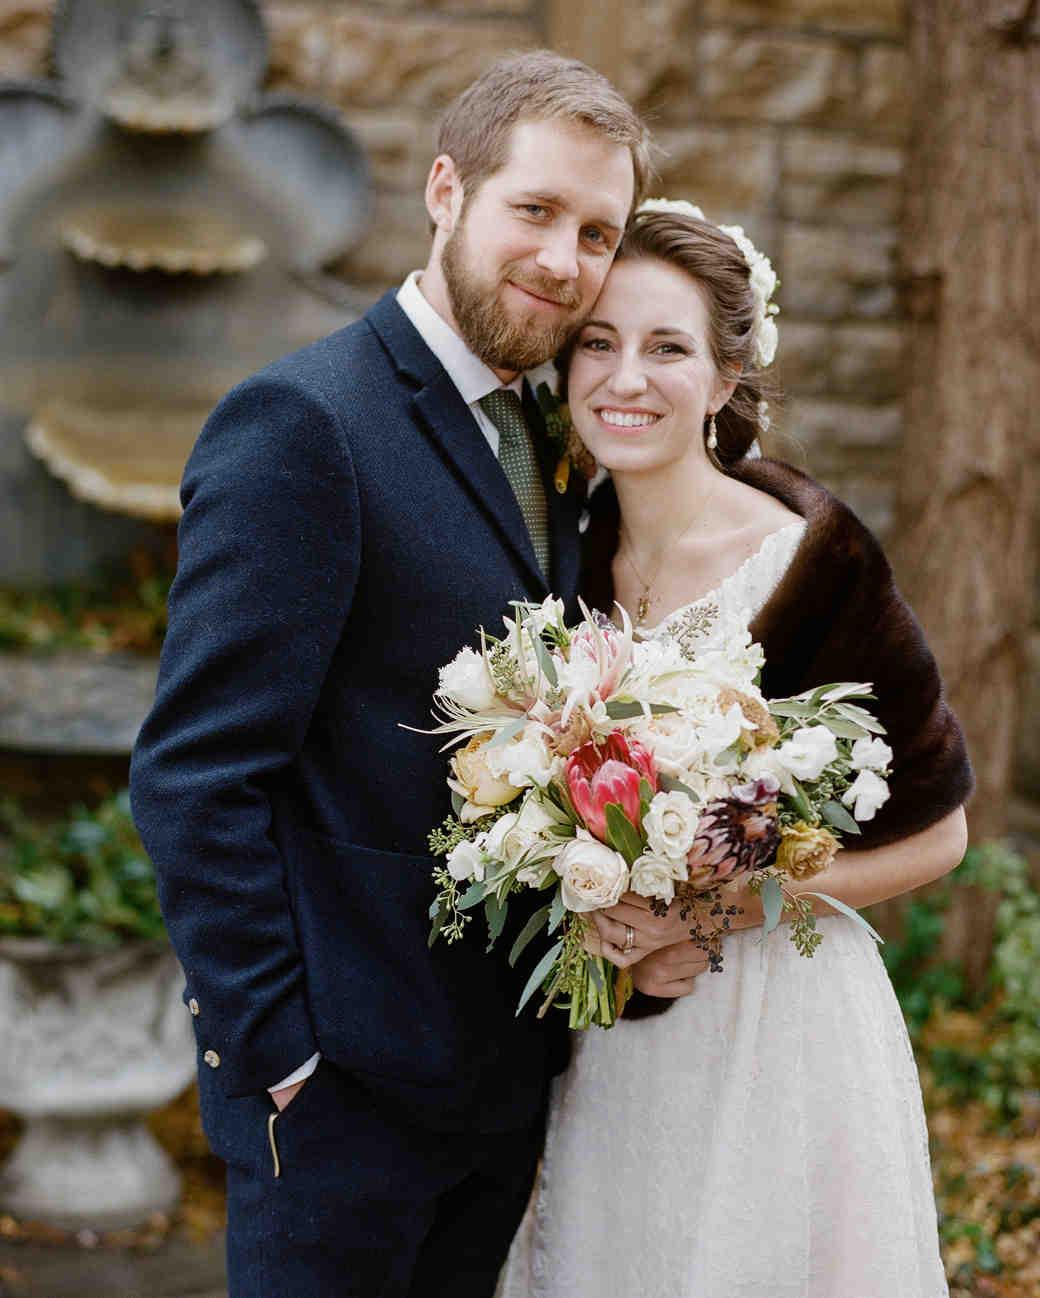 sidney-dane-wedding-couple-154-s112109-0815.jpg